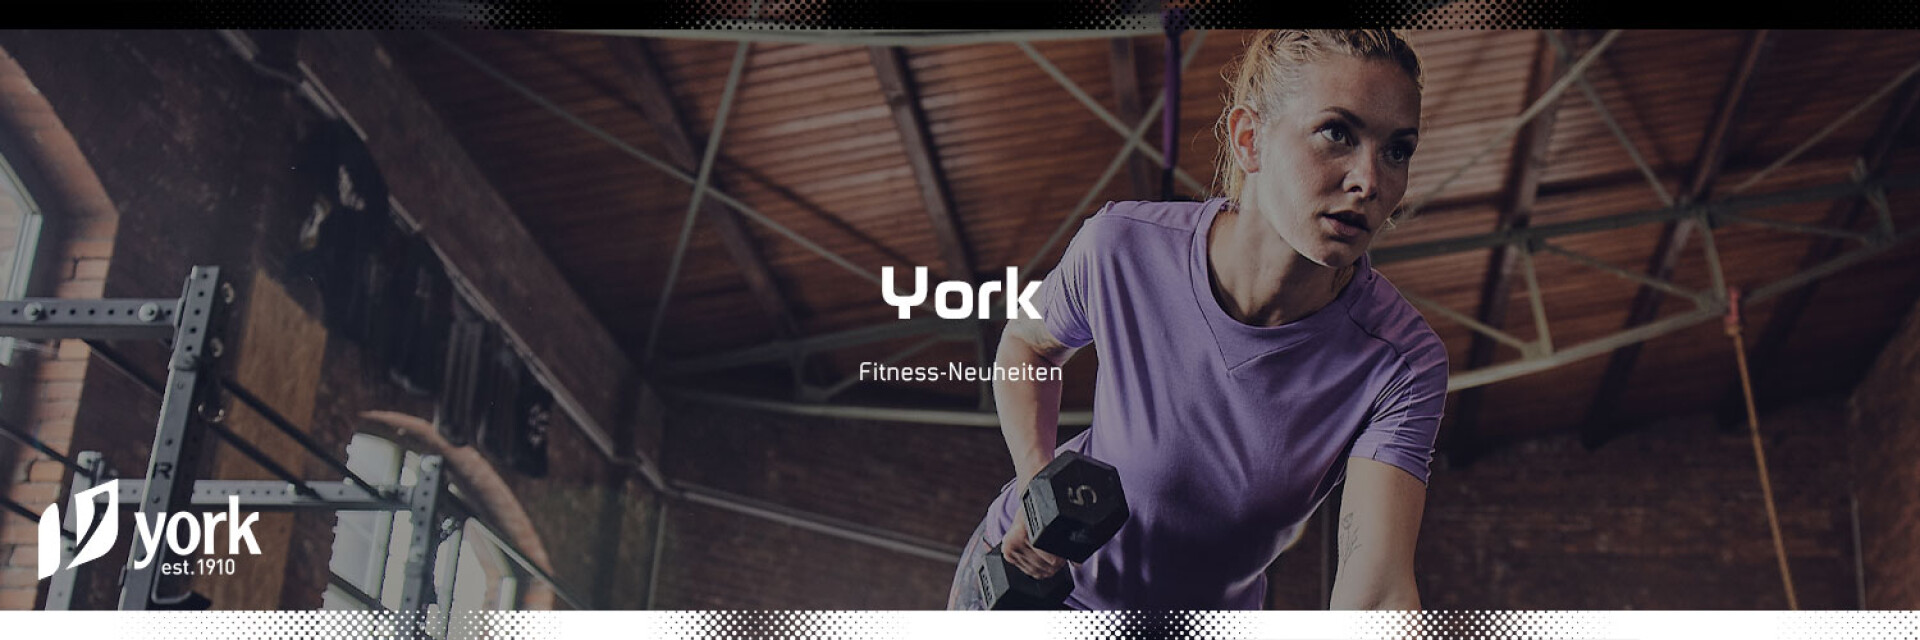 York Fitness bei SPORT 2000